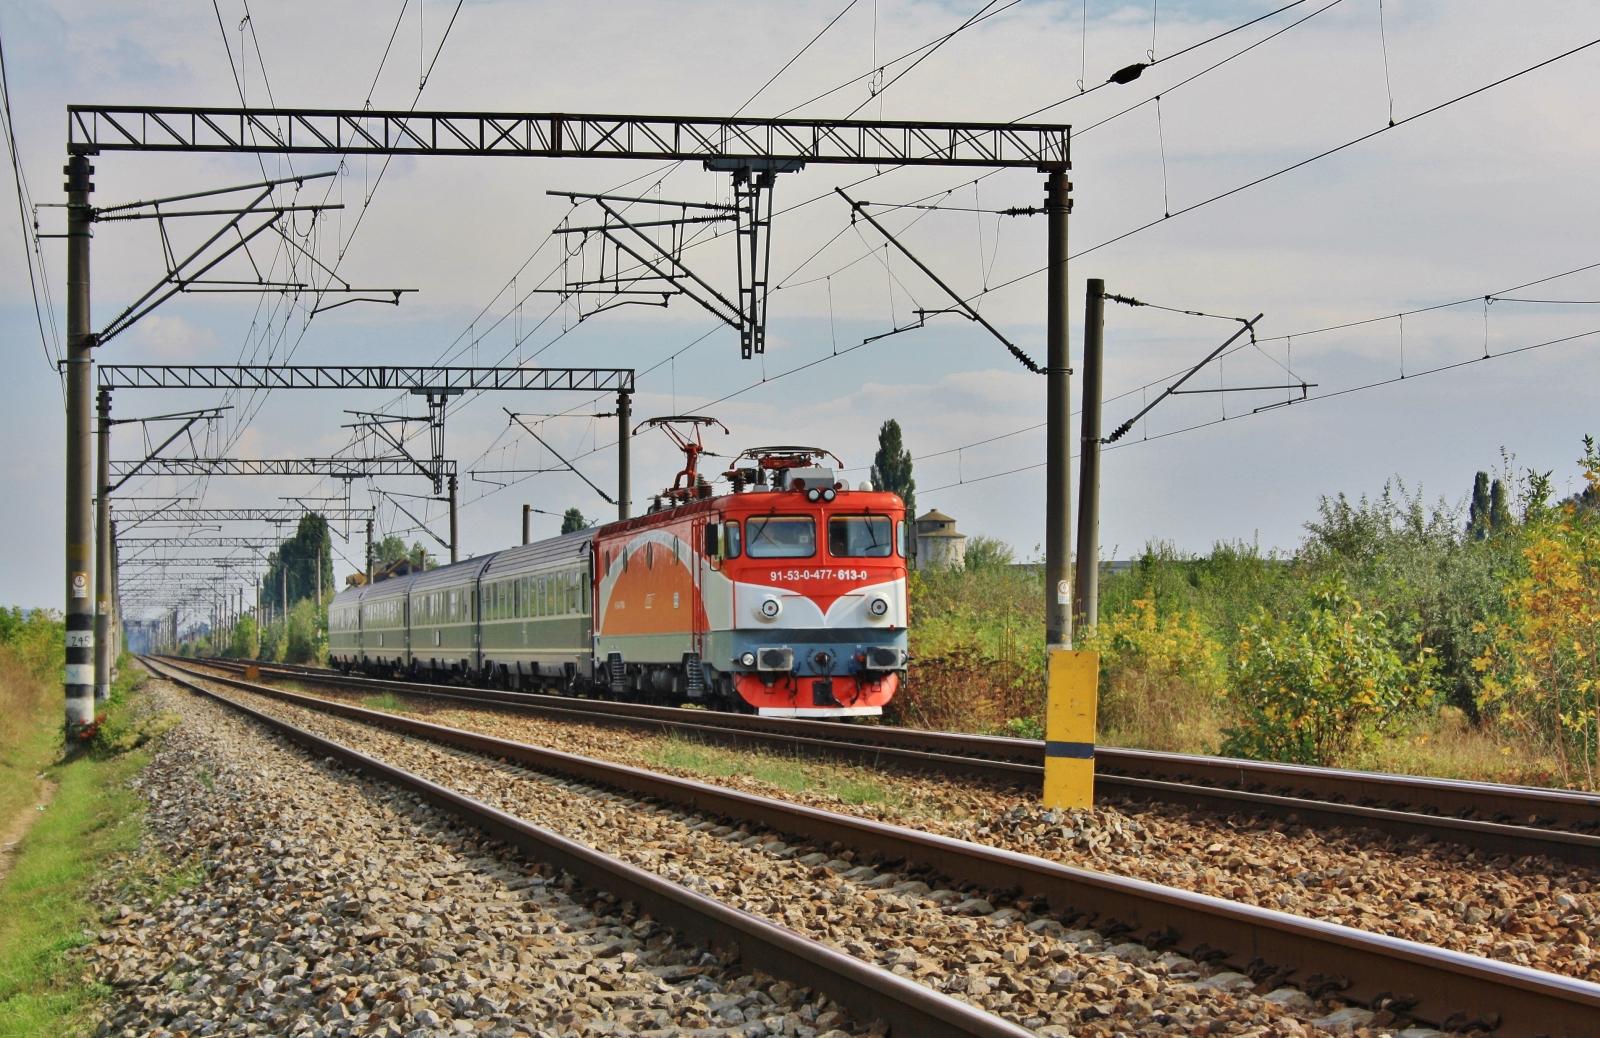 Bucuresti - Chitila 2010 by metrouusor